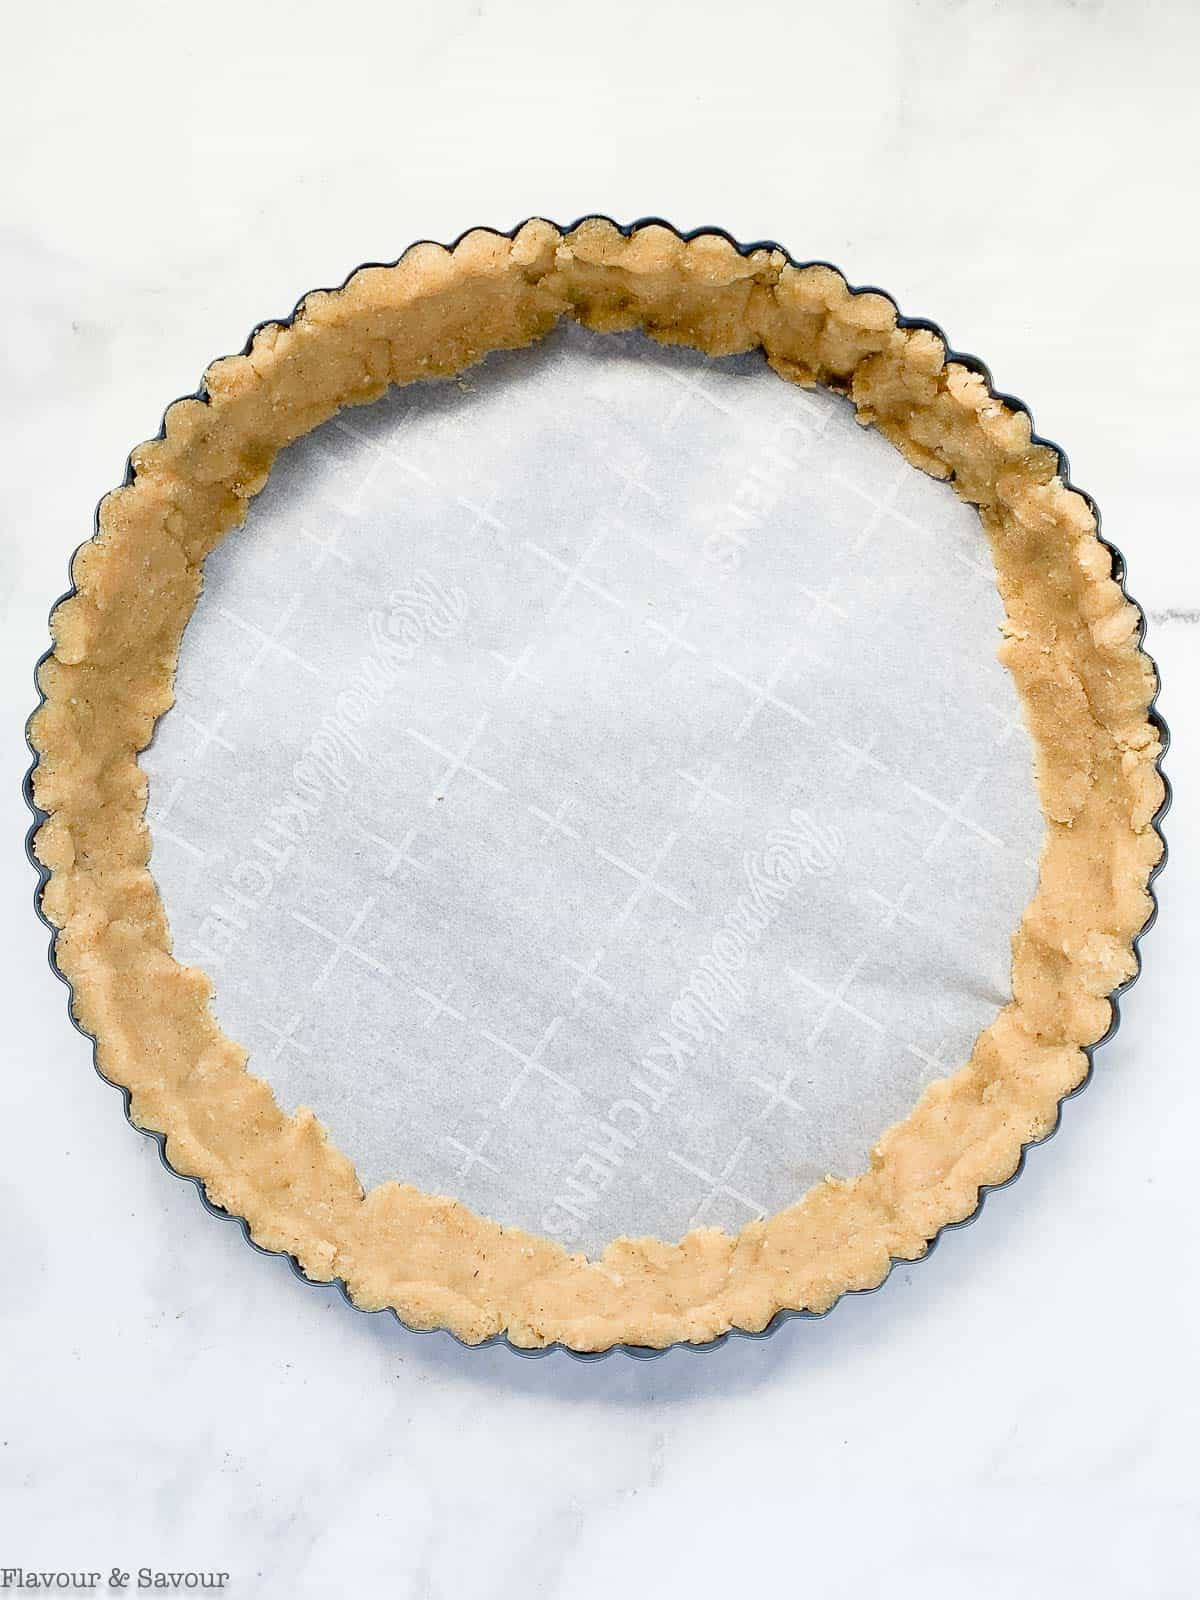 Pressing almond flour crust into edges of pan.